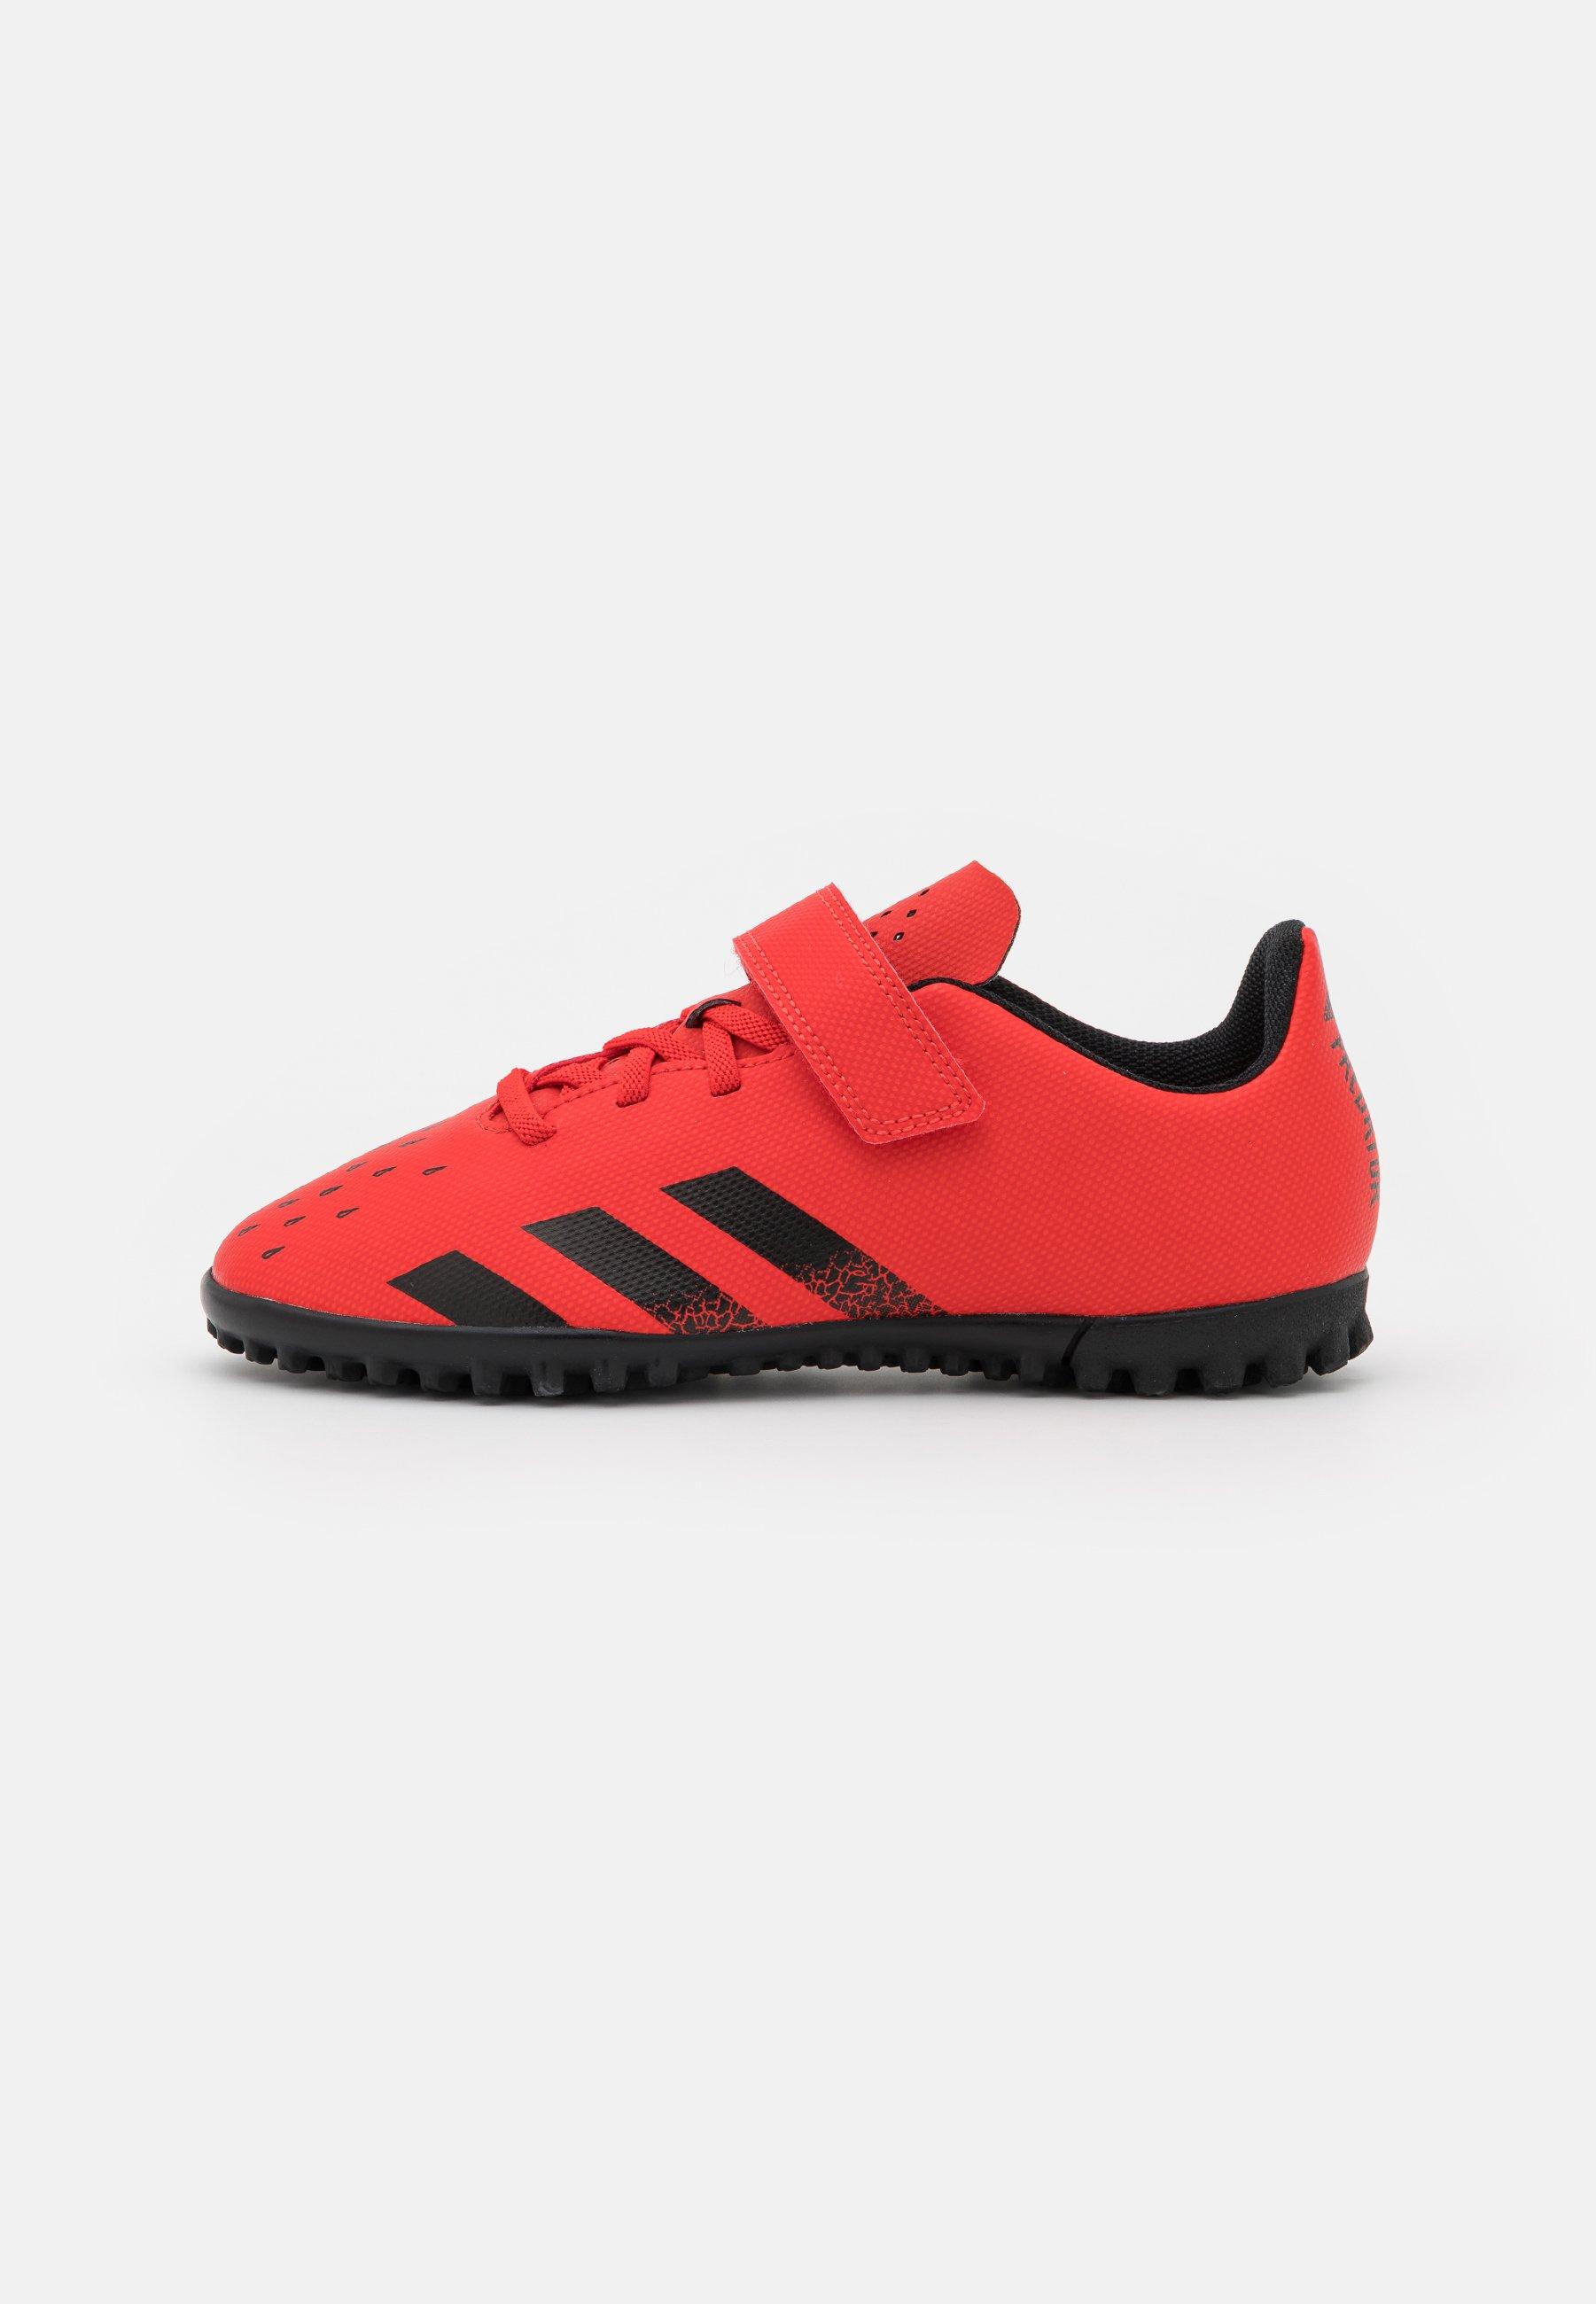 Enfant PREDATOR FREAK TF J UNISEX - Chaussures de foot multicrampons